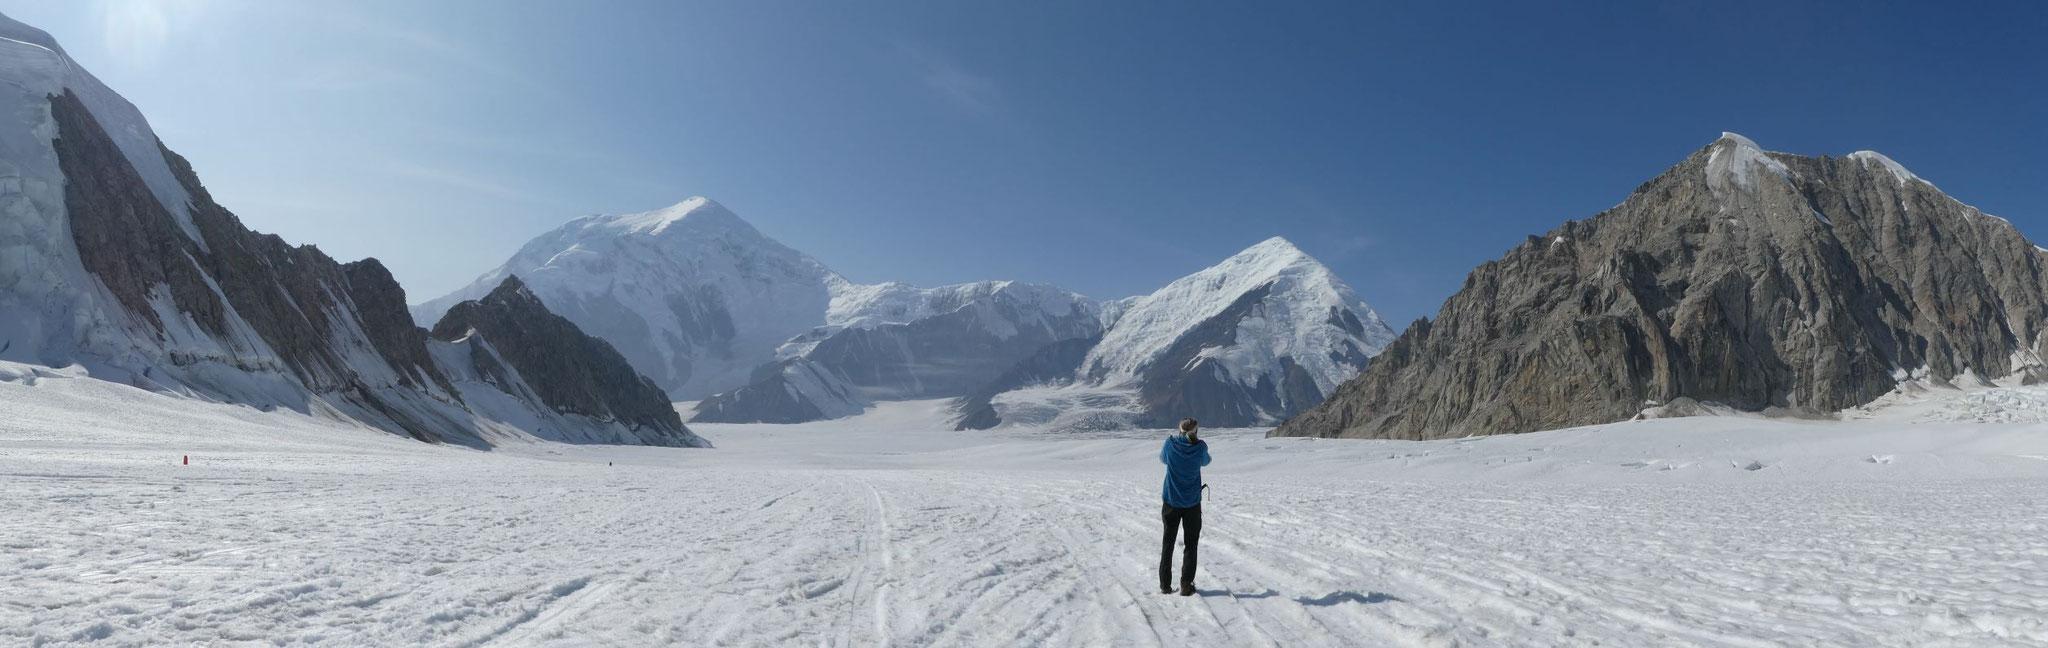 am Denali Base Camp mit Blick auf den 5304m hohen Mt. Foraker